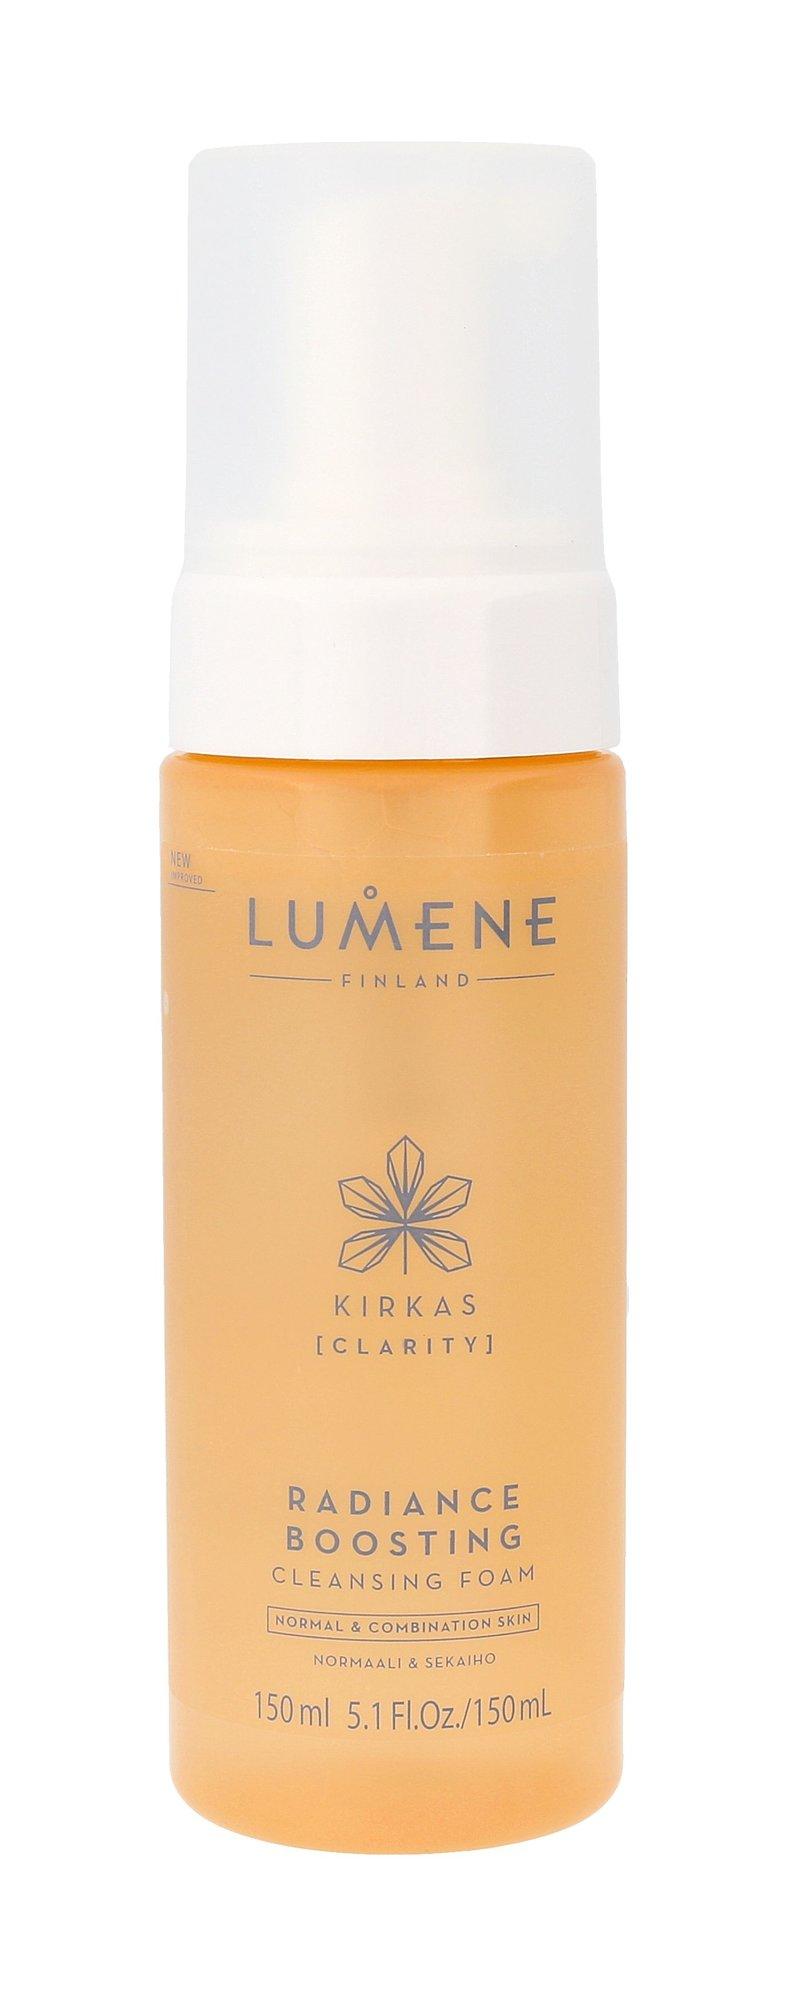 Lumene Clarity Radiance Boosting Cleansing Foam Cosmetic 150ml